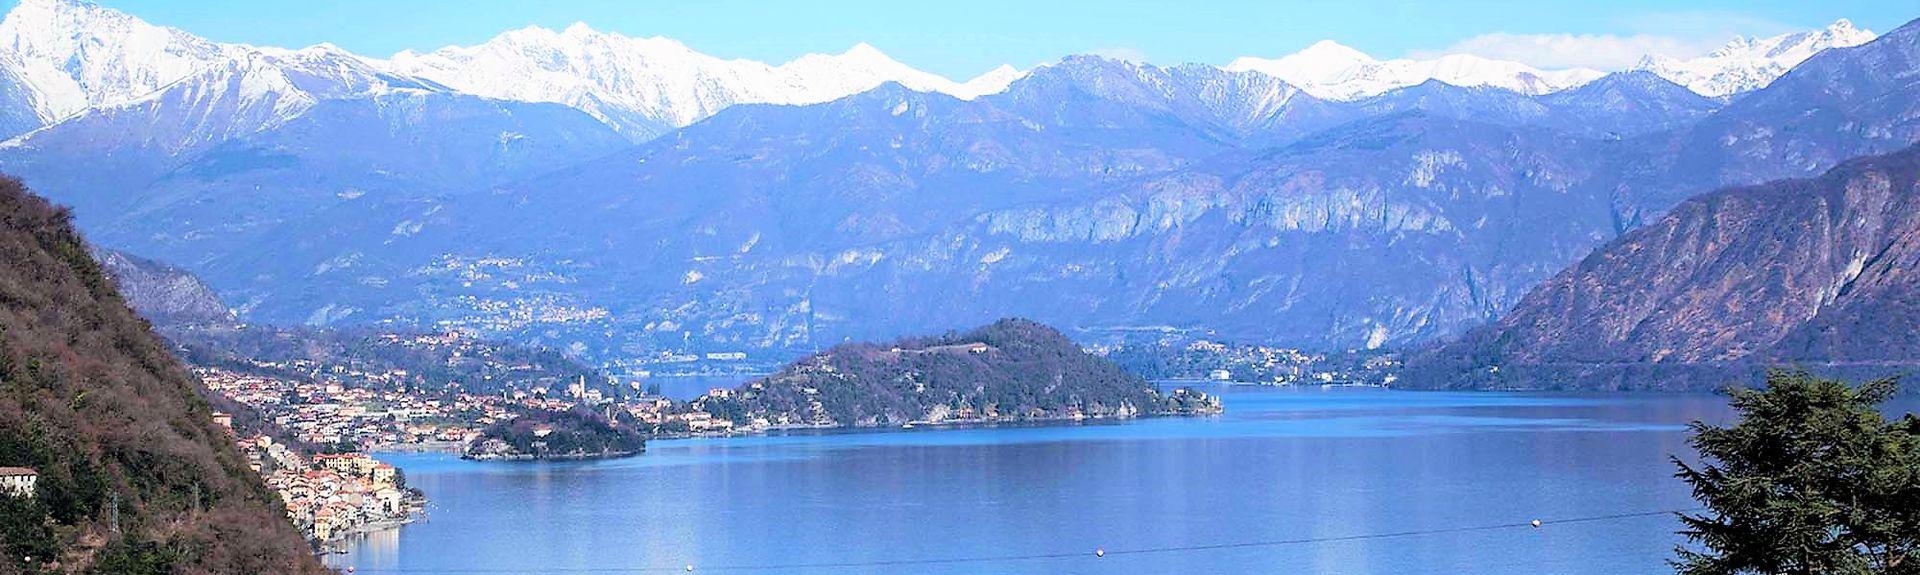 Plesio, Lombardy, Italy